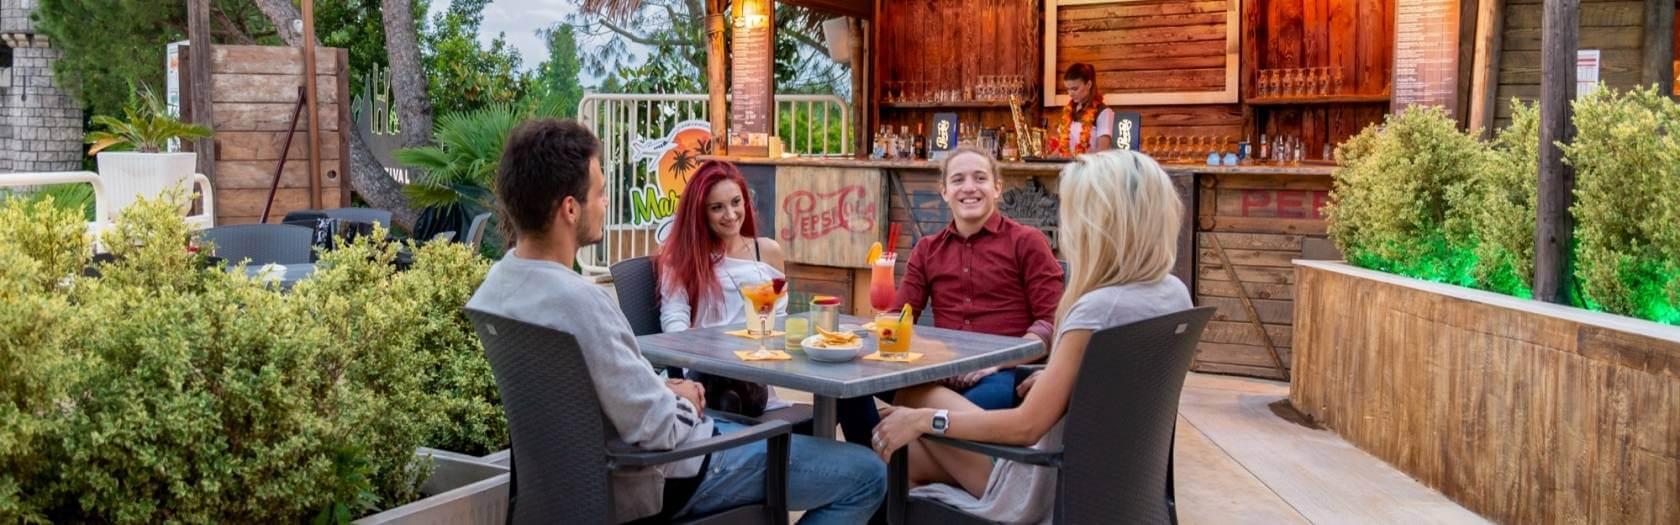 Margaritas Cocktail Bar